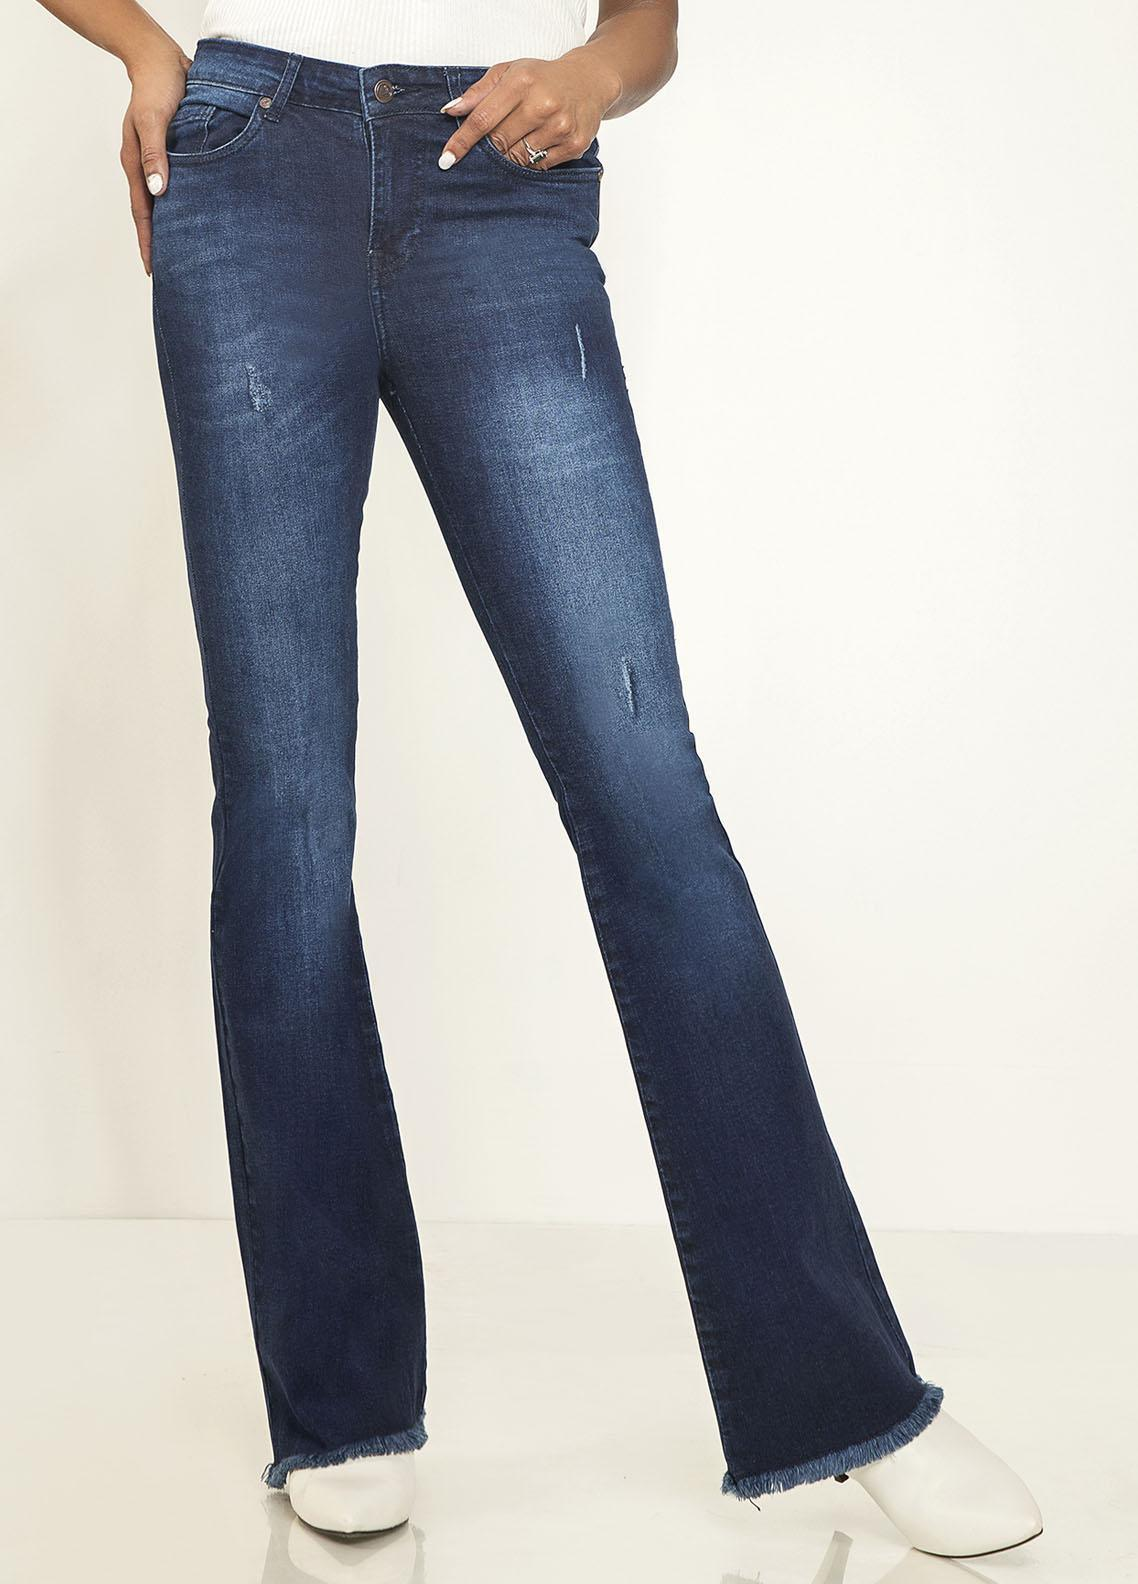 Kross Kulture Perfect Curves Denim Jeans KWA-20-001 DGO